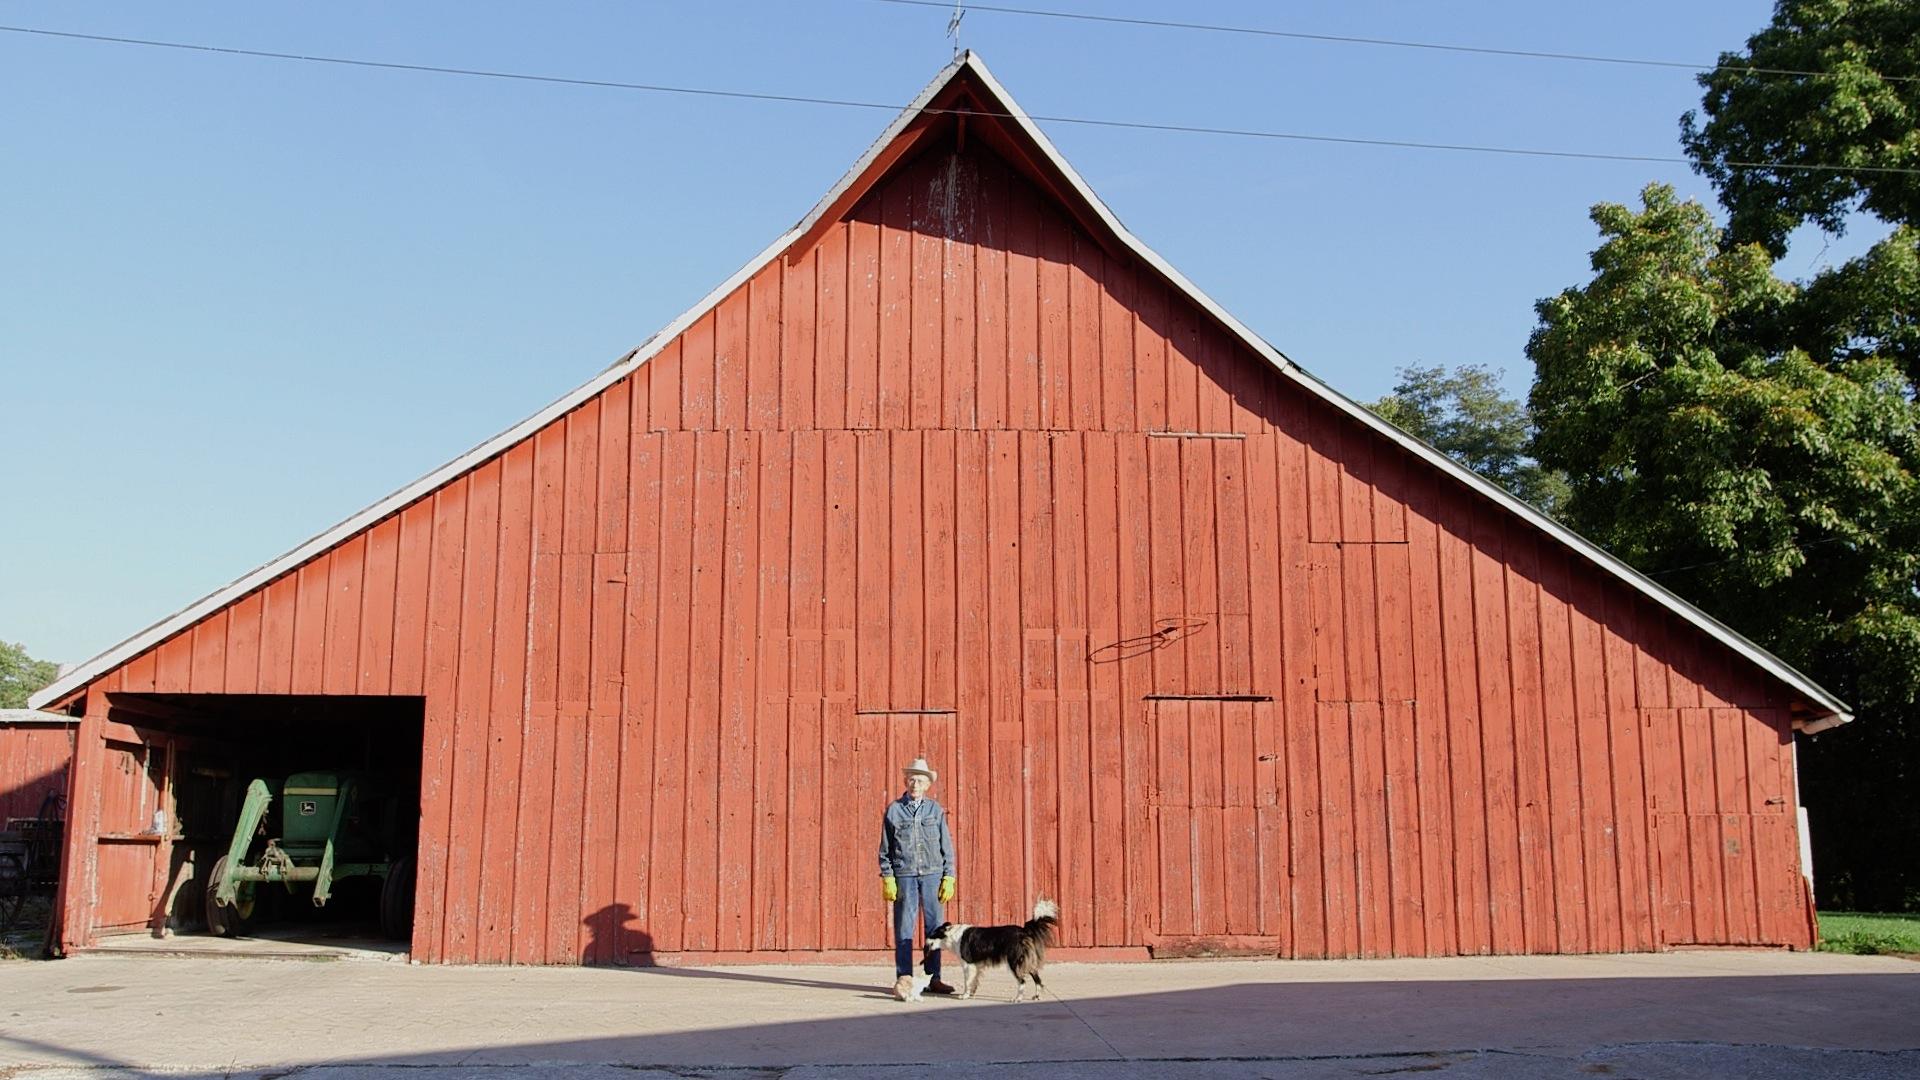 Walter in front of barn.jpg